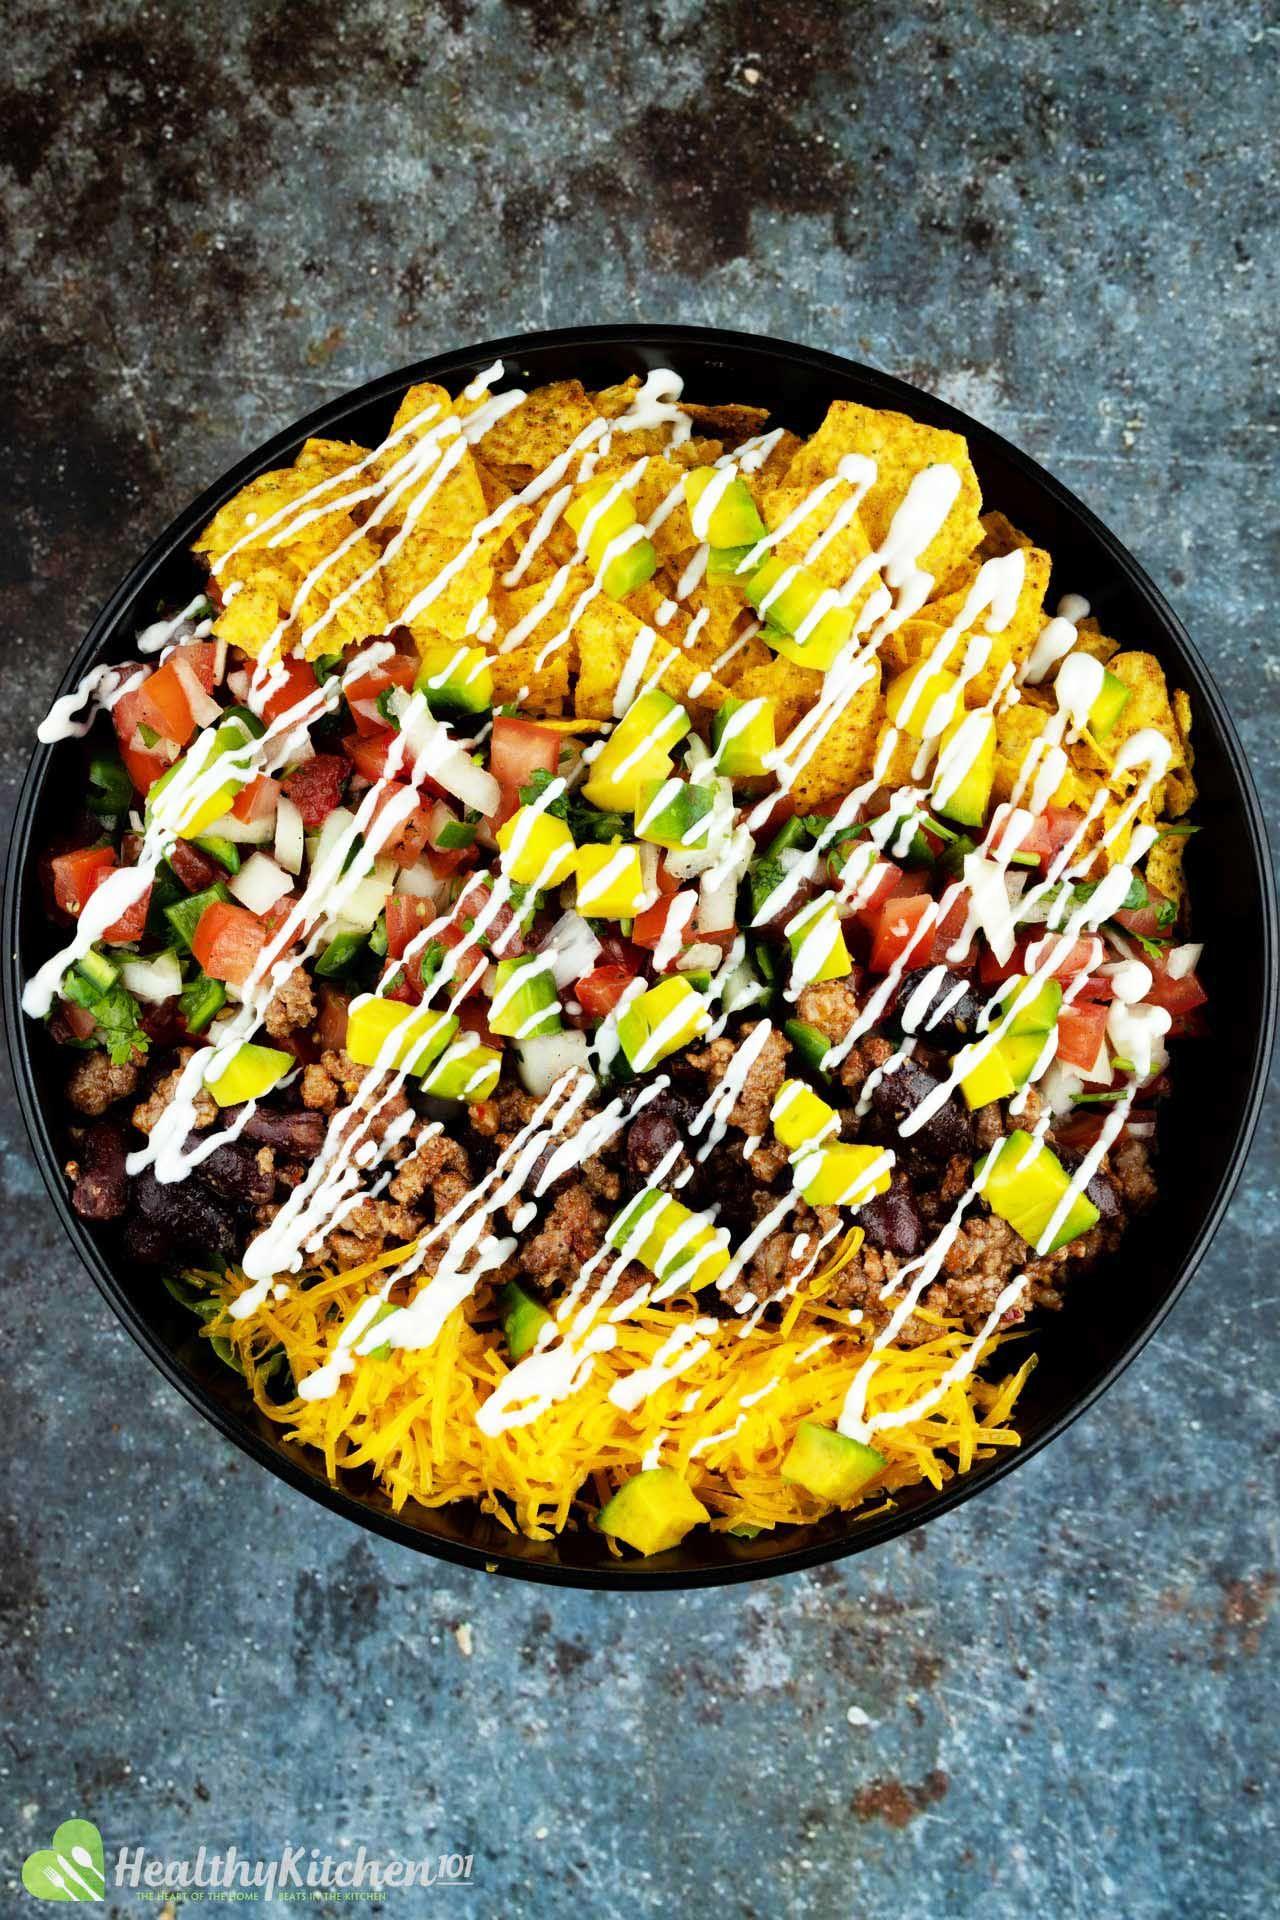 How to make Taco Salad Recipe